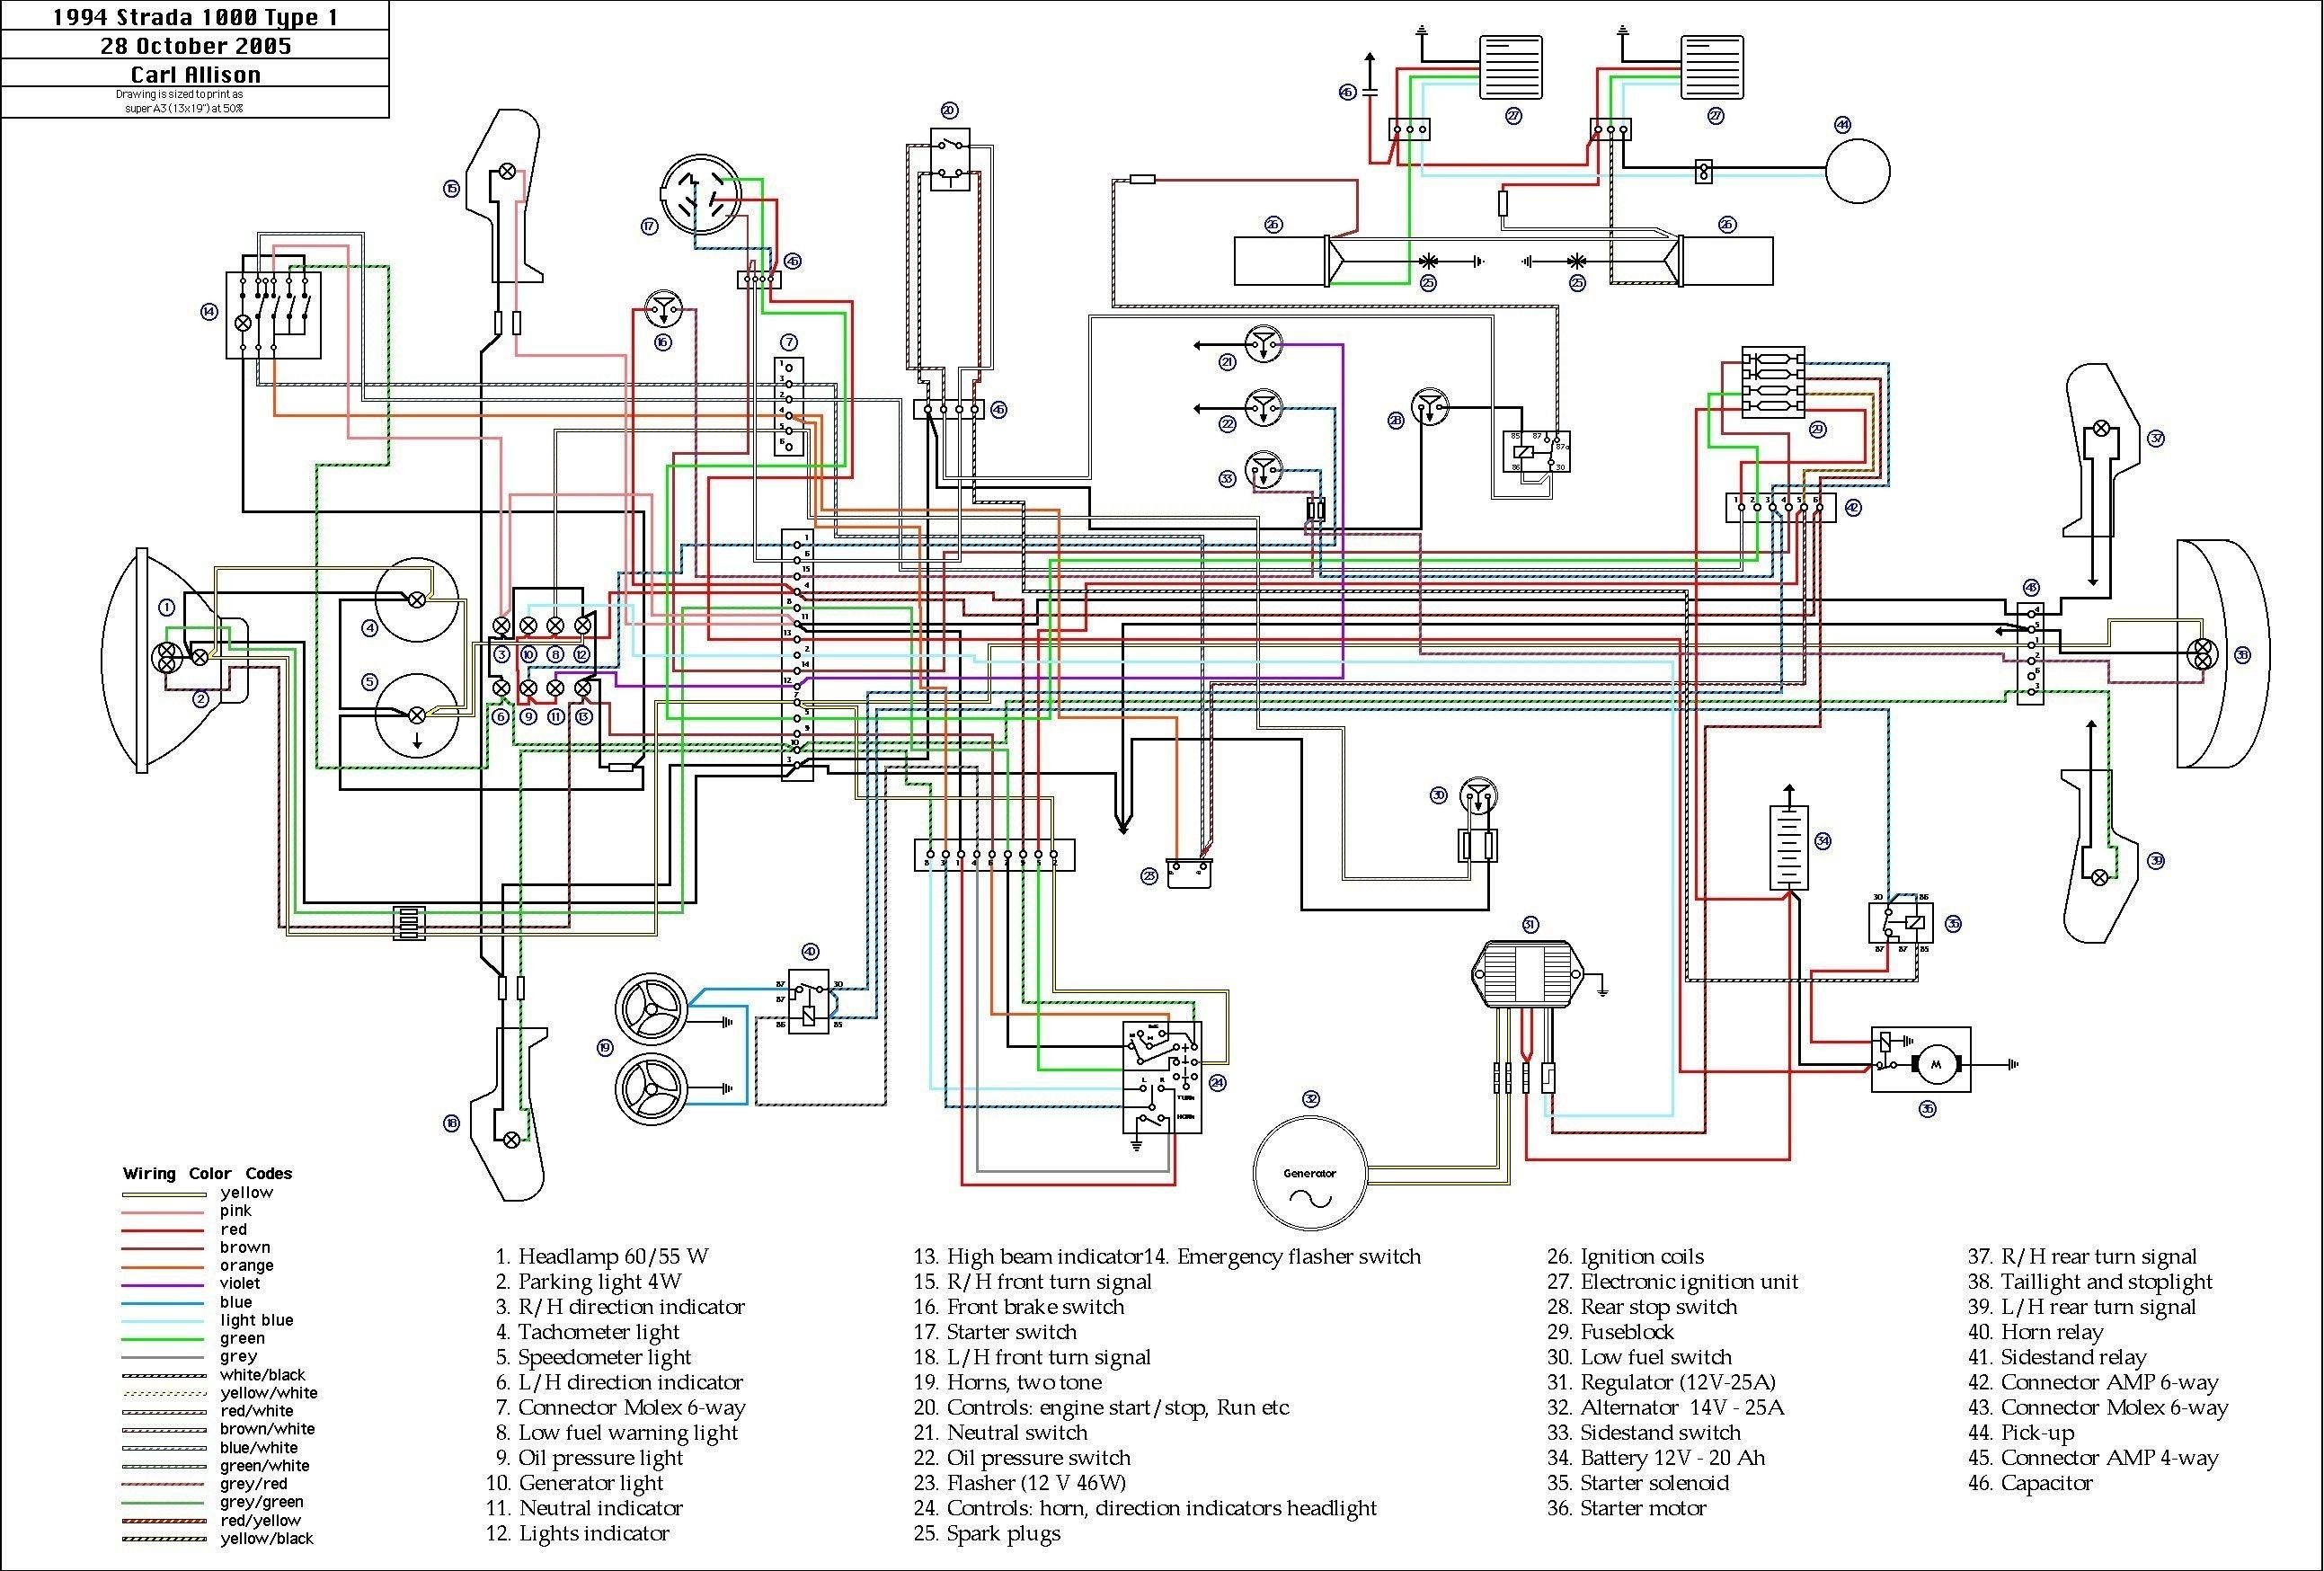 Unique Audi A4 B8 Headlight Wiring Diagram #diagram #diagramtemplate  #diagramsample Check more at ht… | Sistema electrico, Diagrama de circuito  eléctrico, Yamaha dt | Audi Headlight Wiring Schematic |  | Pinterest